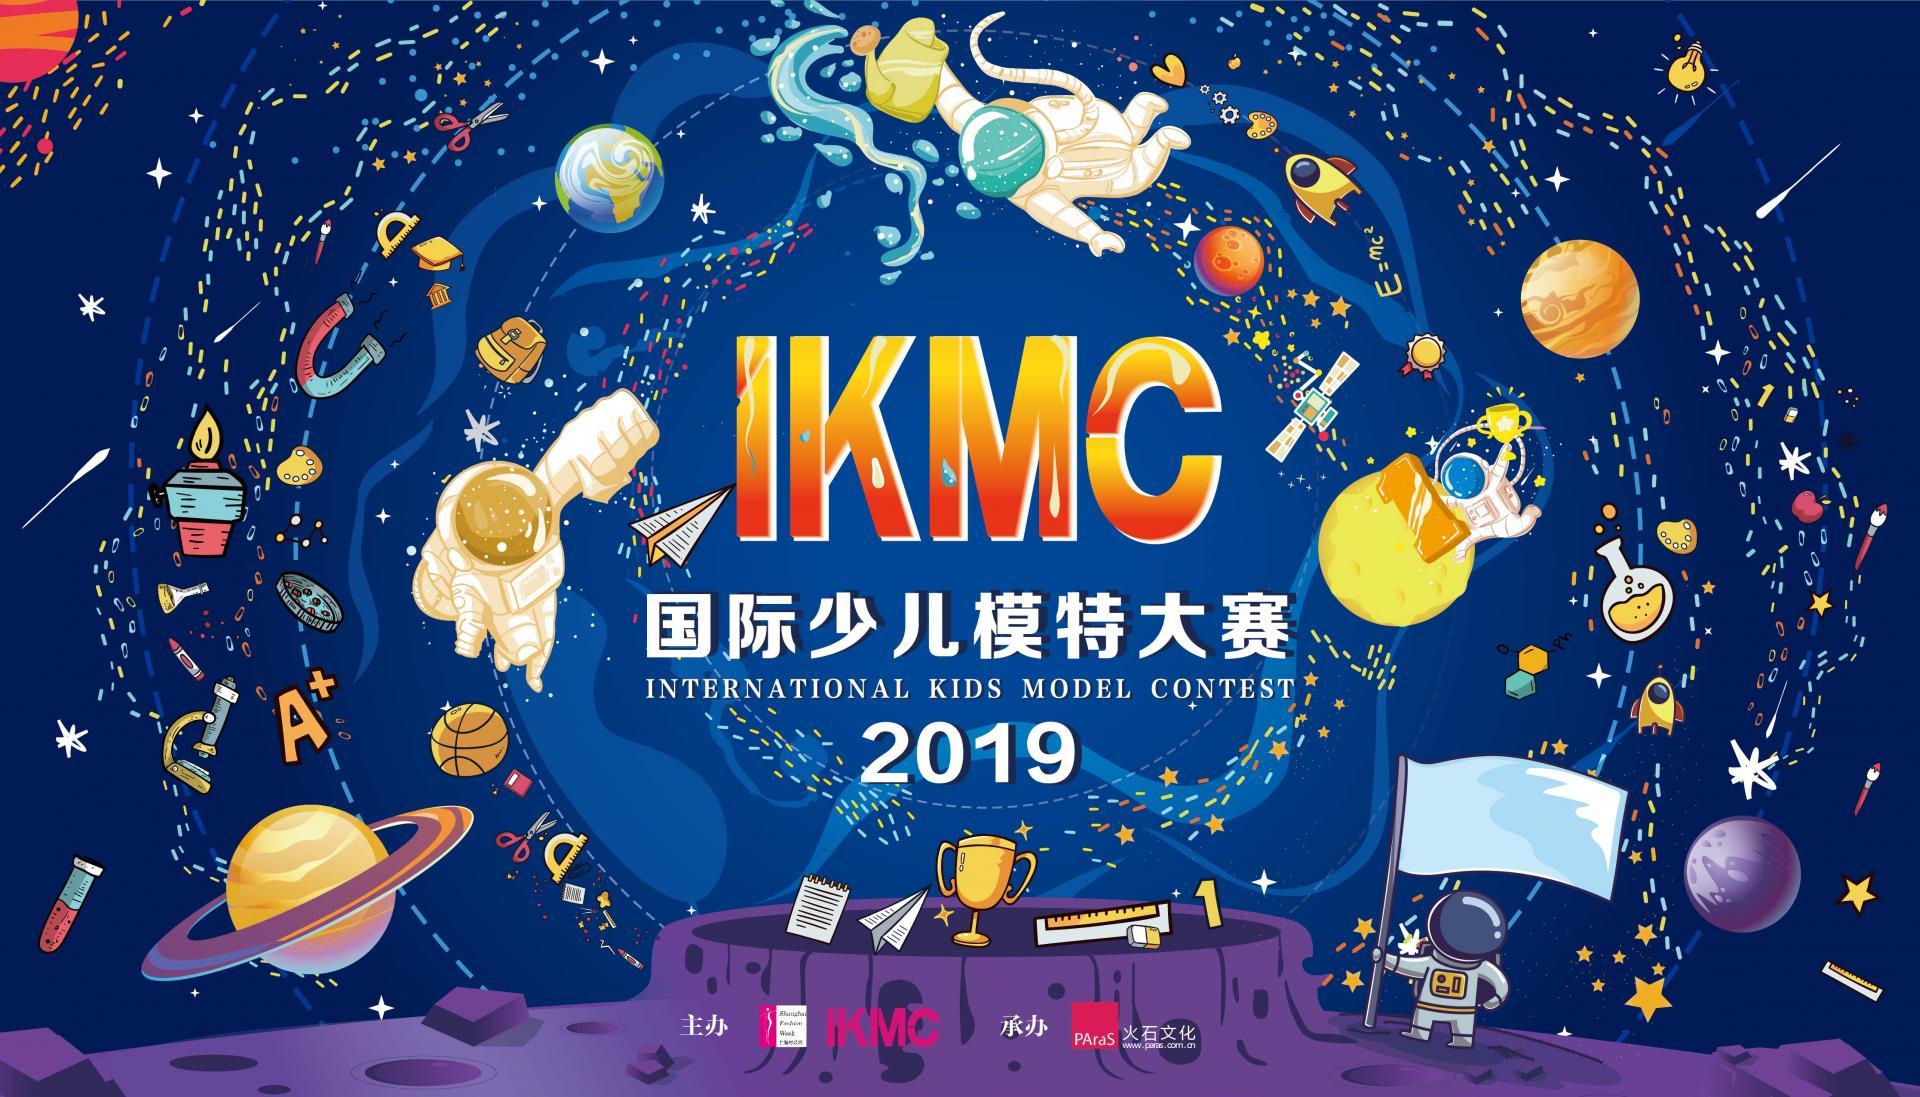 2019IKMC国际少儿模特大赛